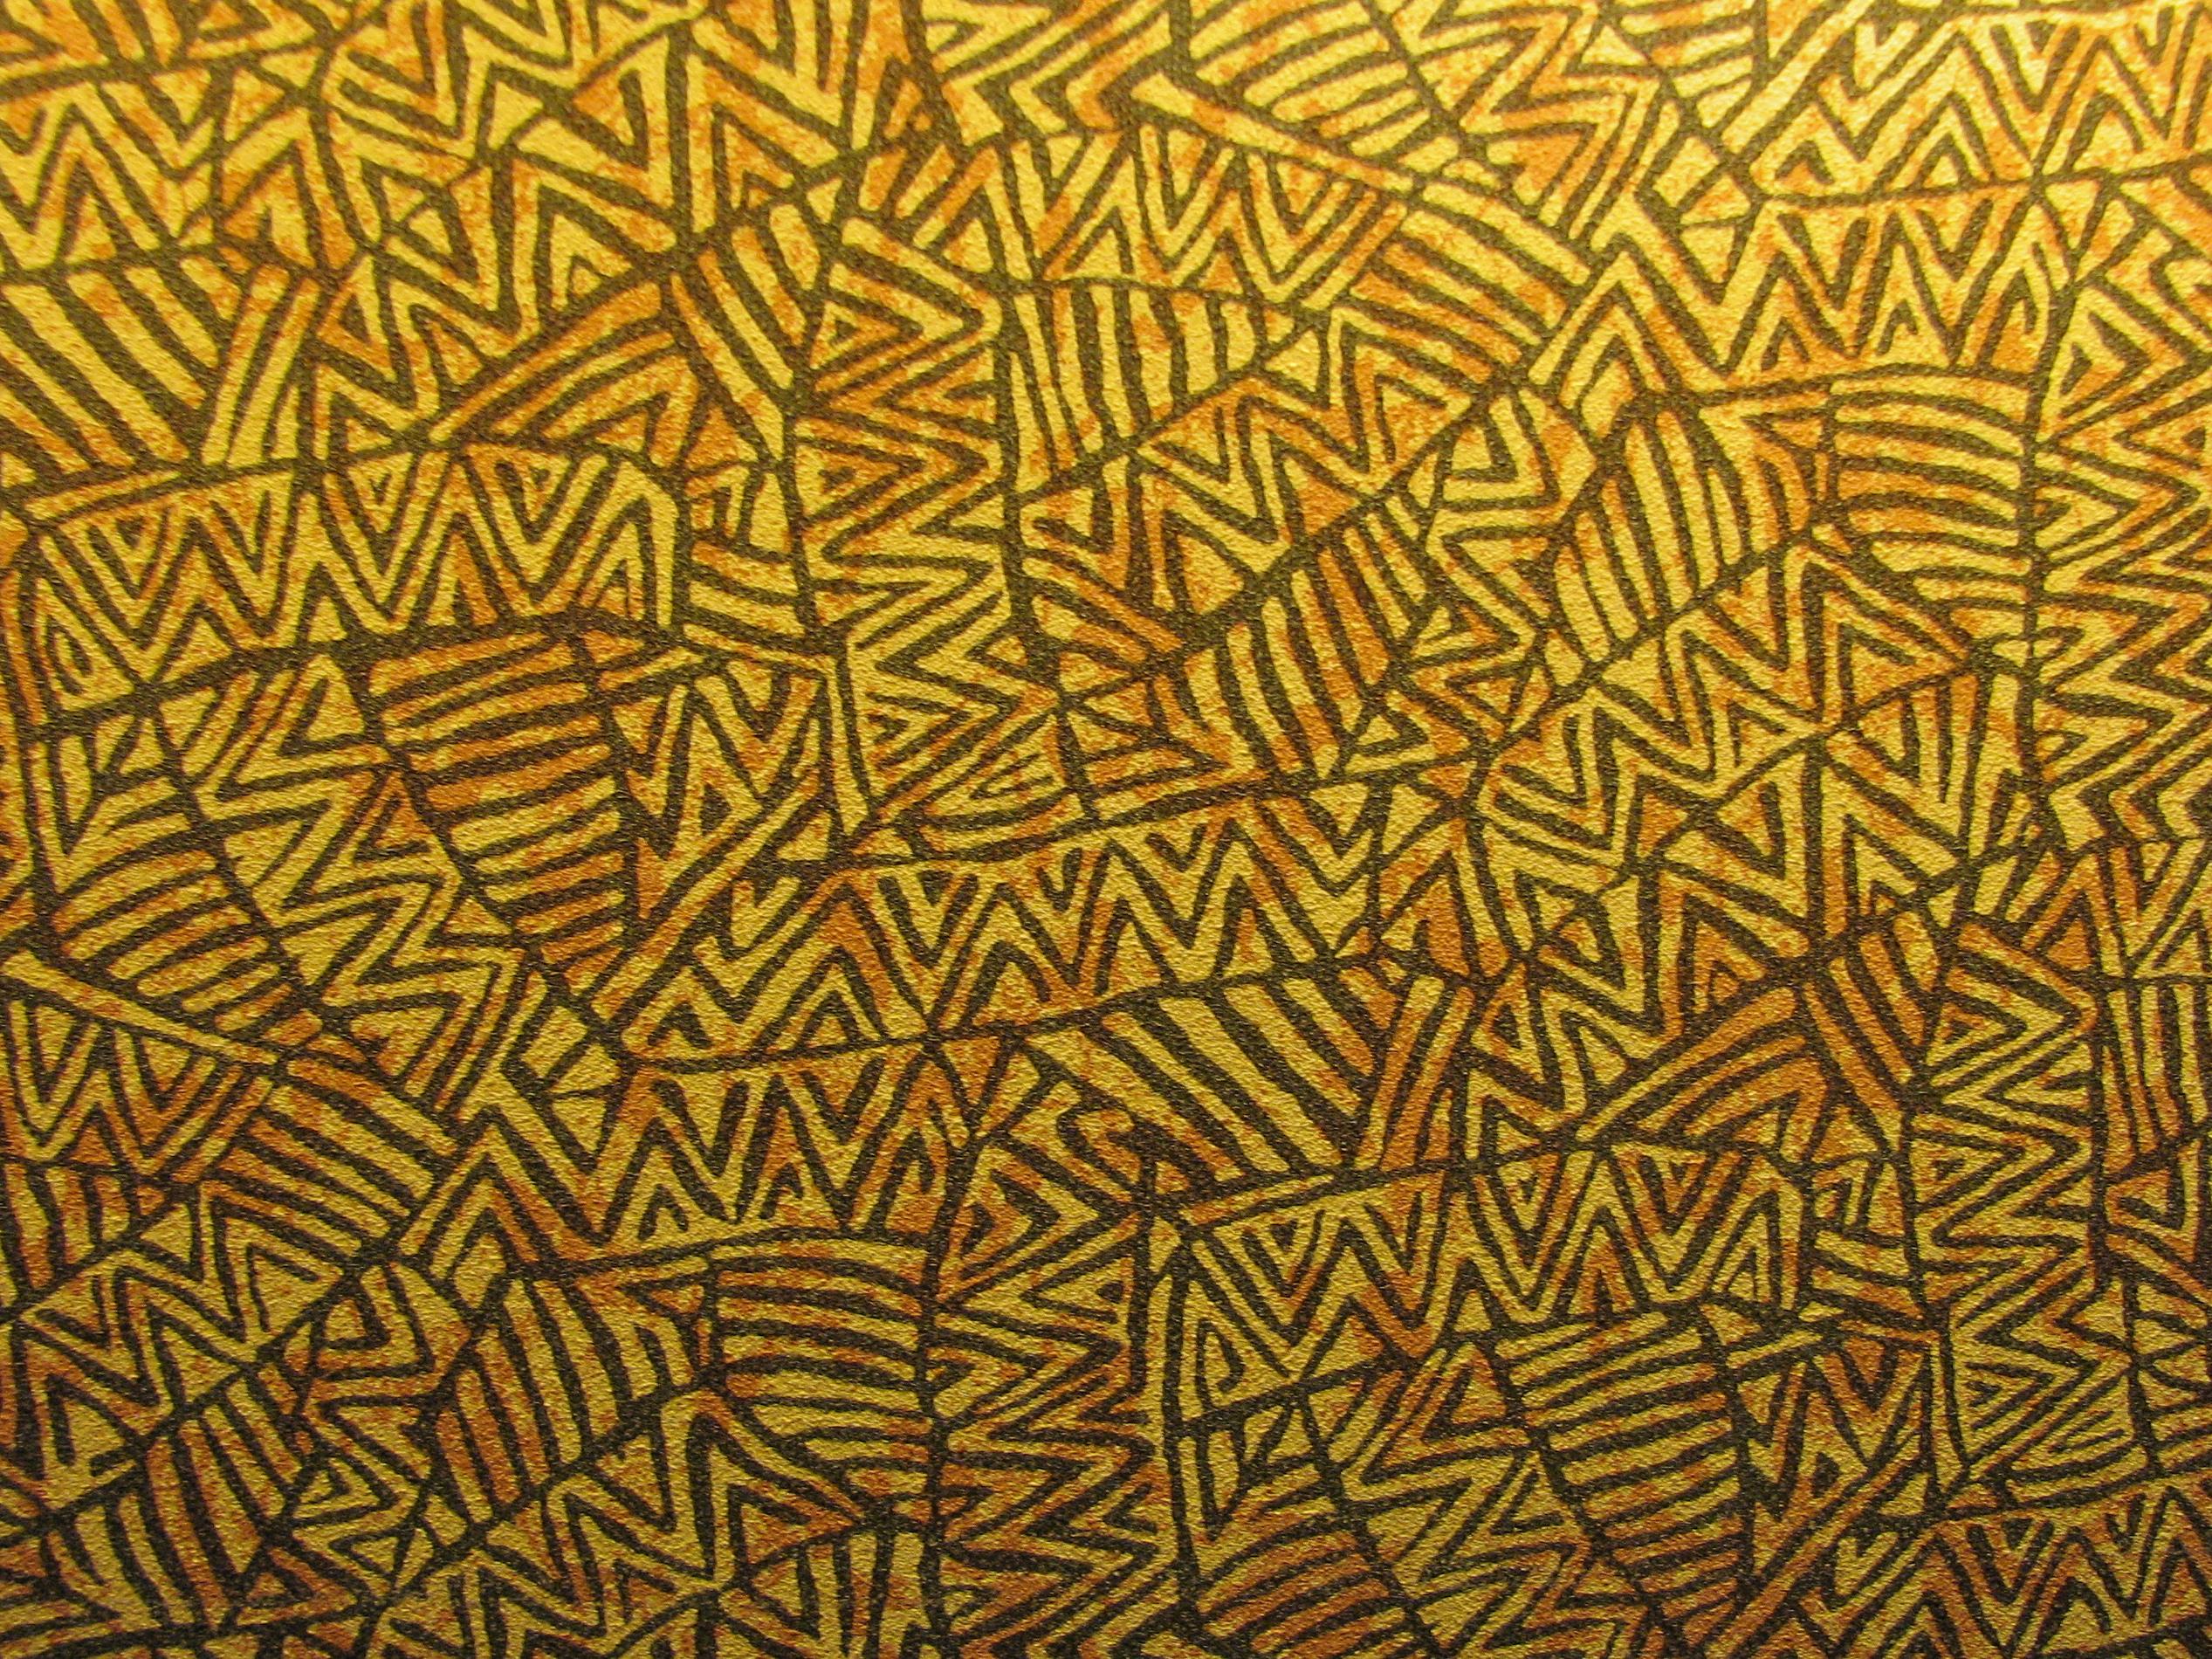 African Textures 5797508531_0f8e830f8a_o.jpg: galleryhip.com/african-textures.html